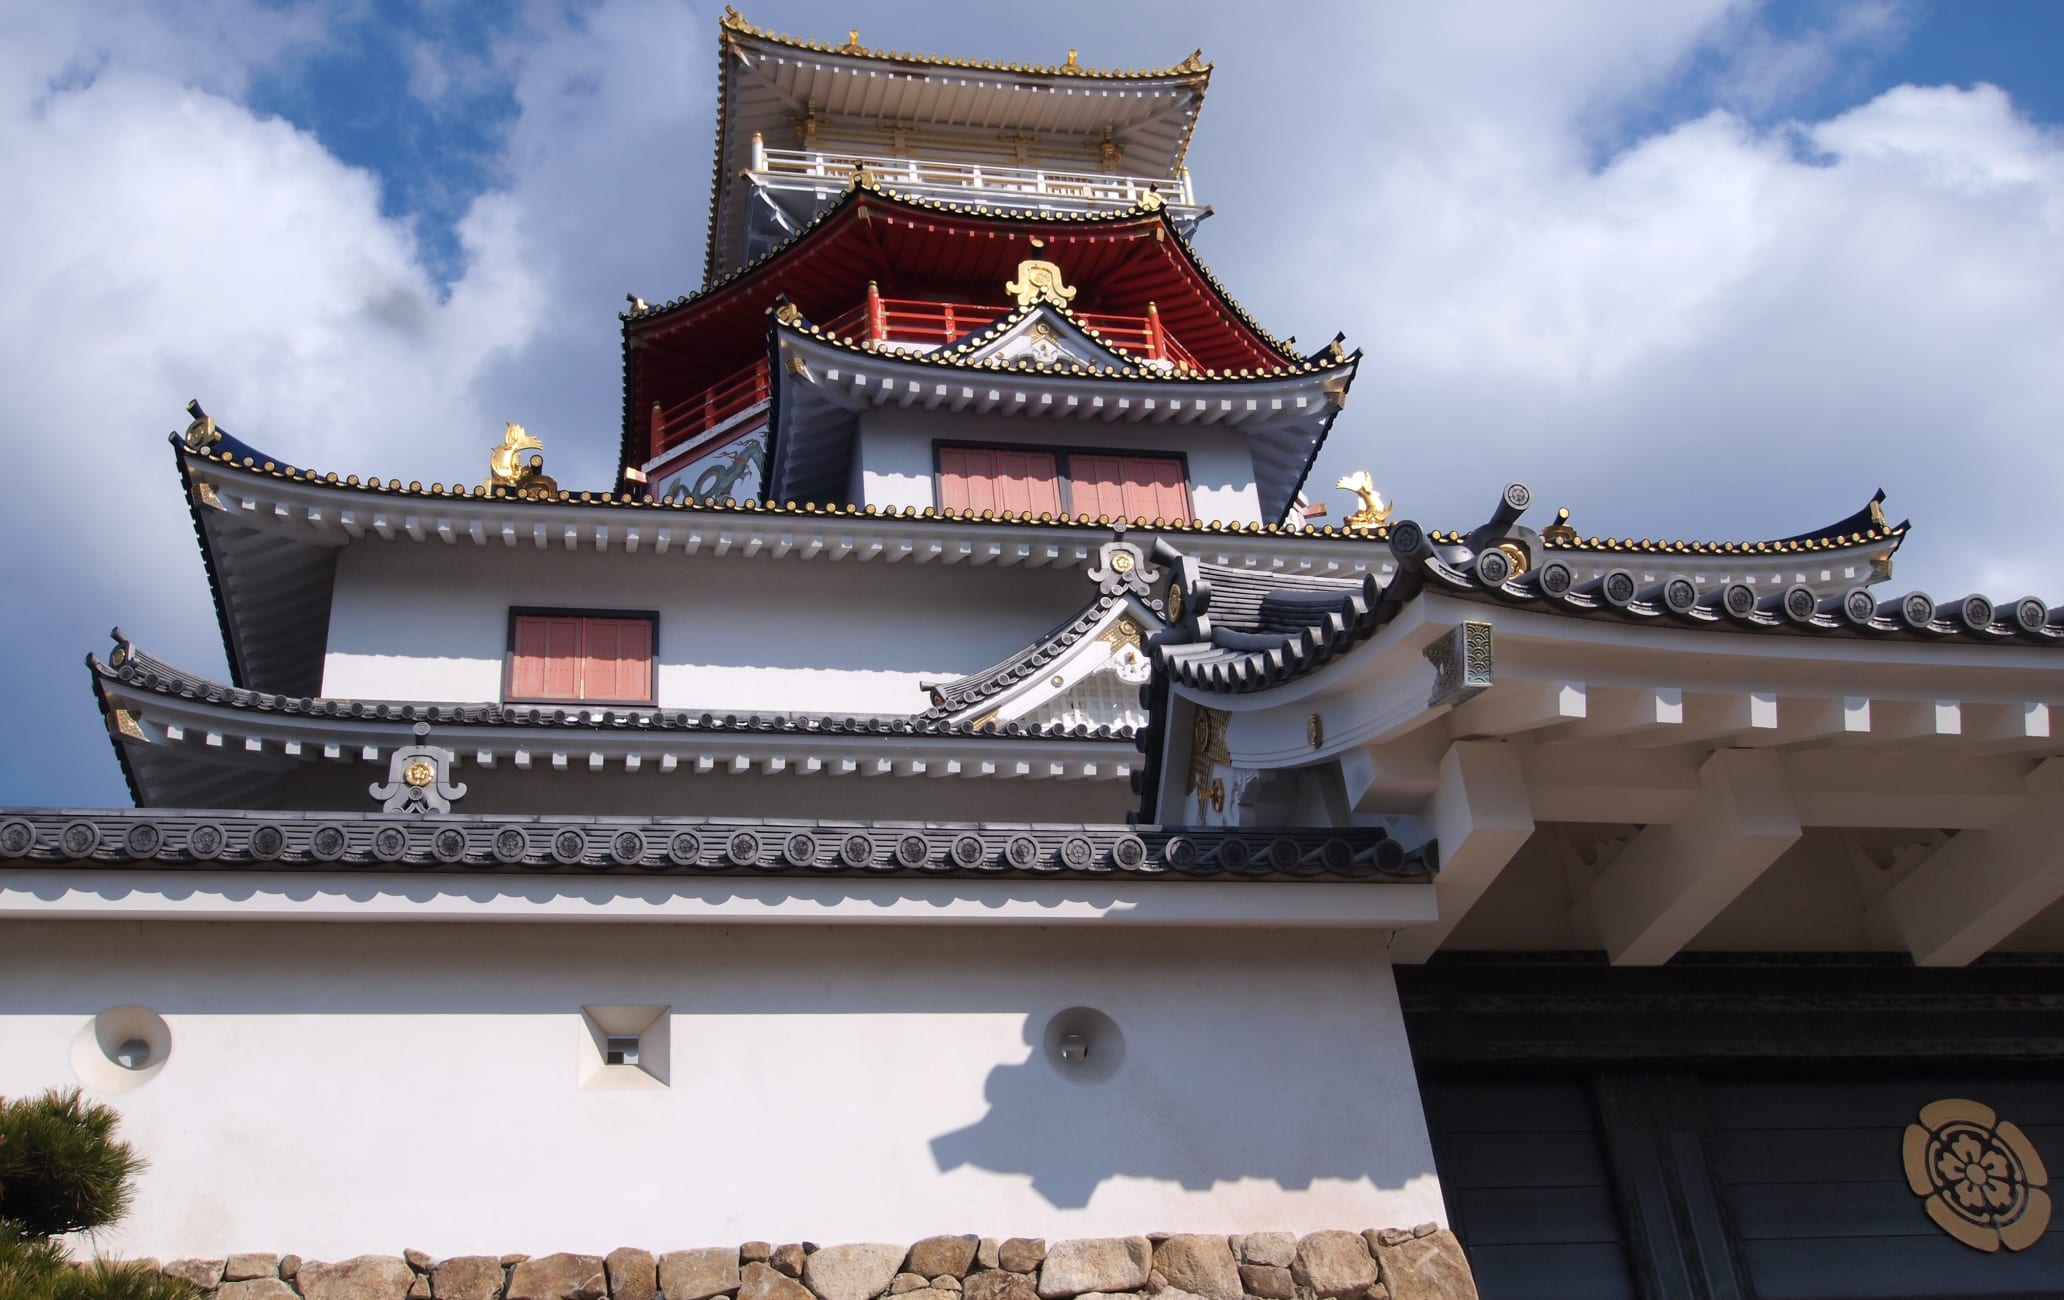 Samurai kingdom & Ninga- Ise